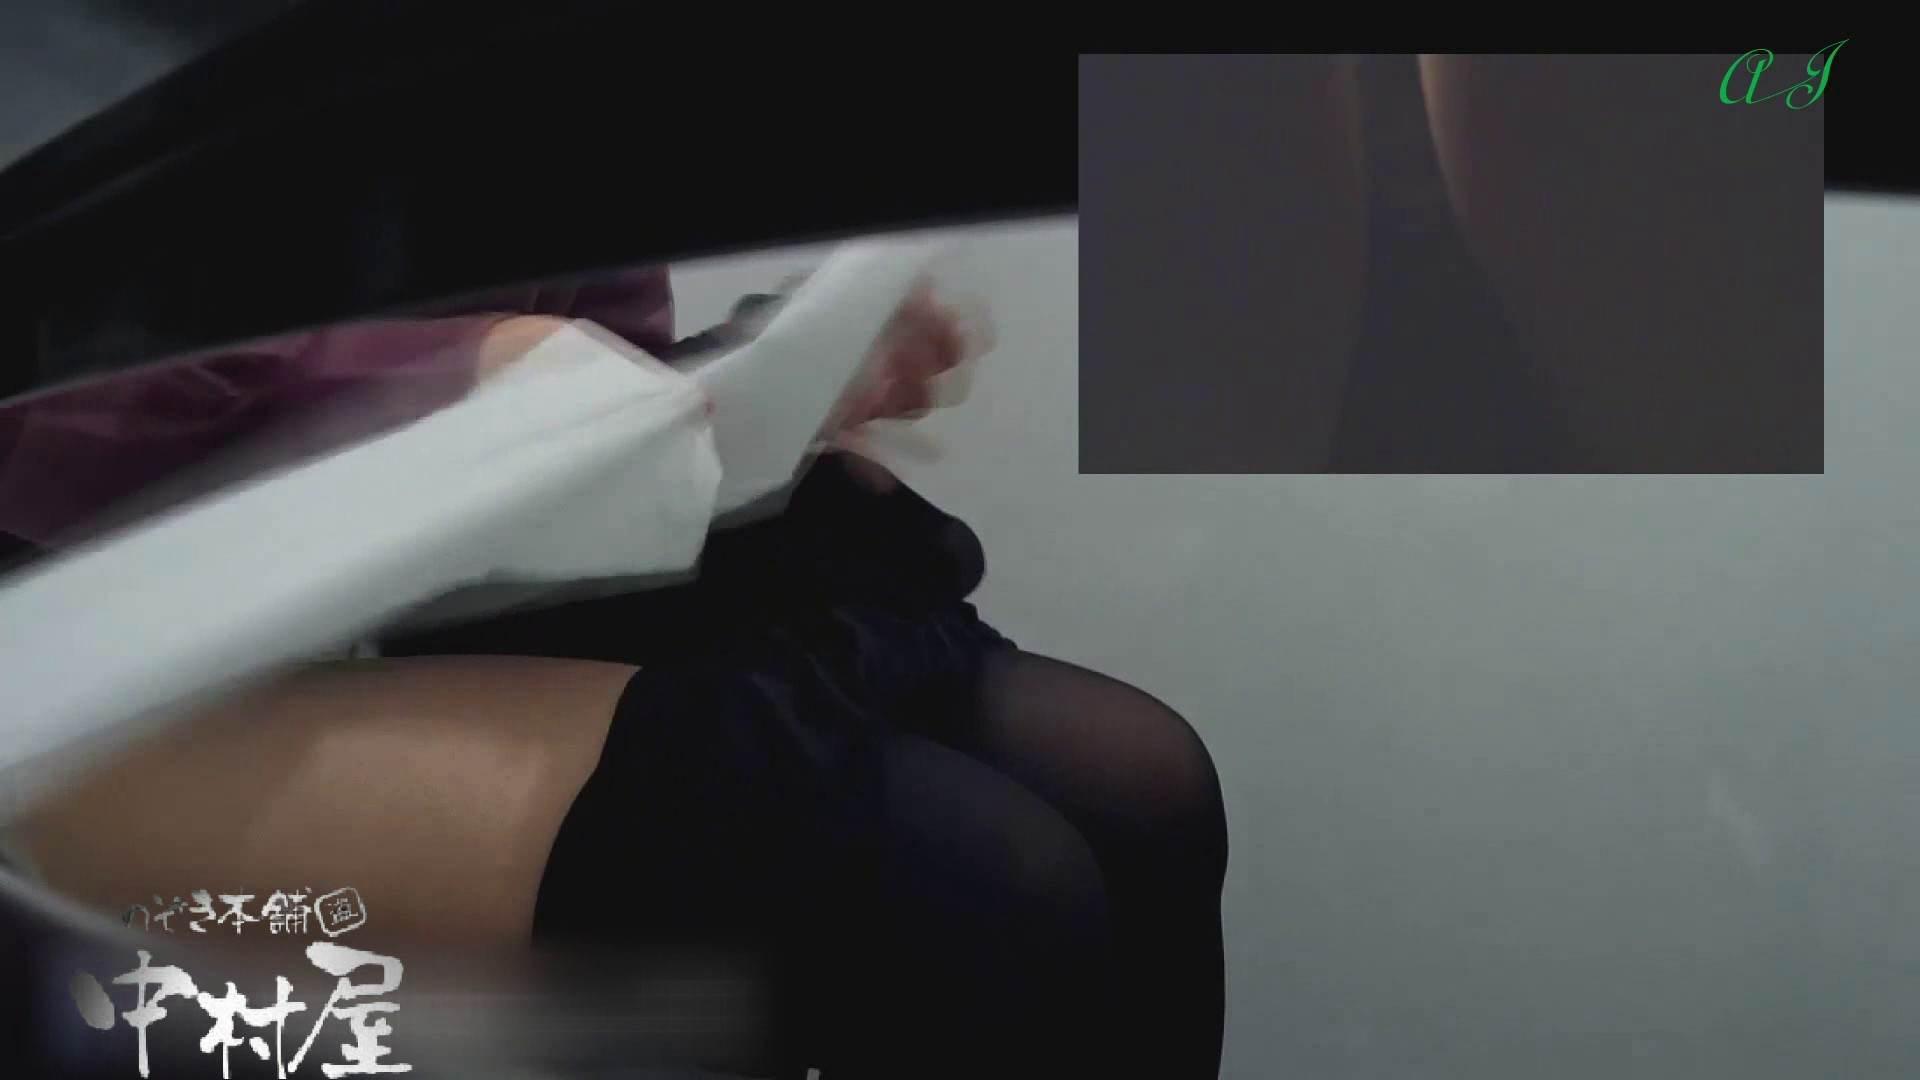 新アングル 4名の美女達 有名大学女性洗面所 vol.76後編 OLエロ画像  68PICs 20